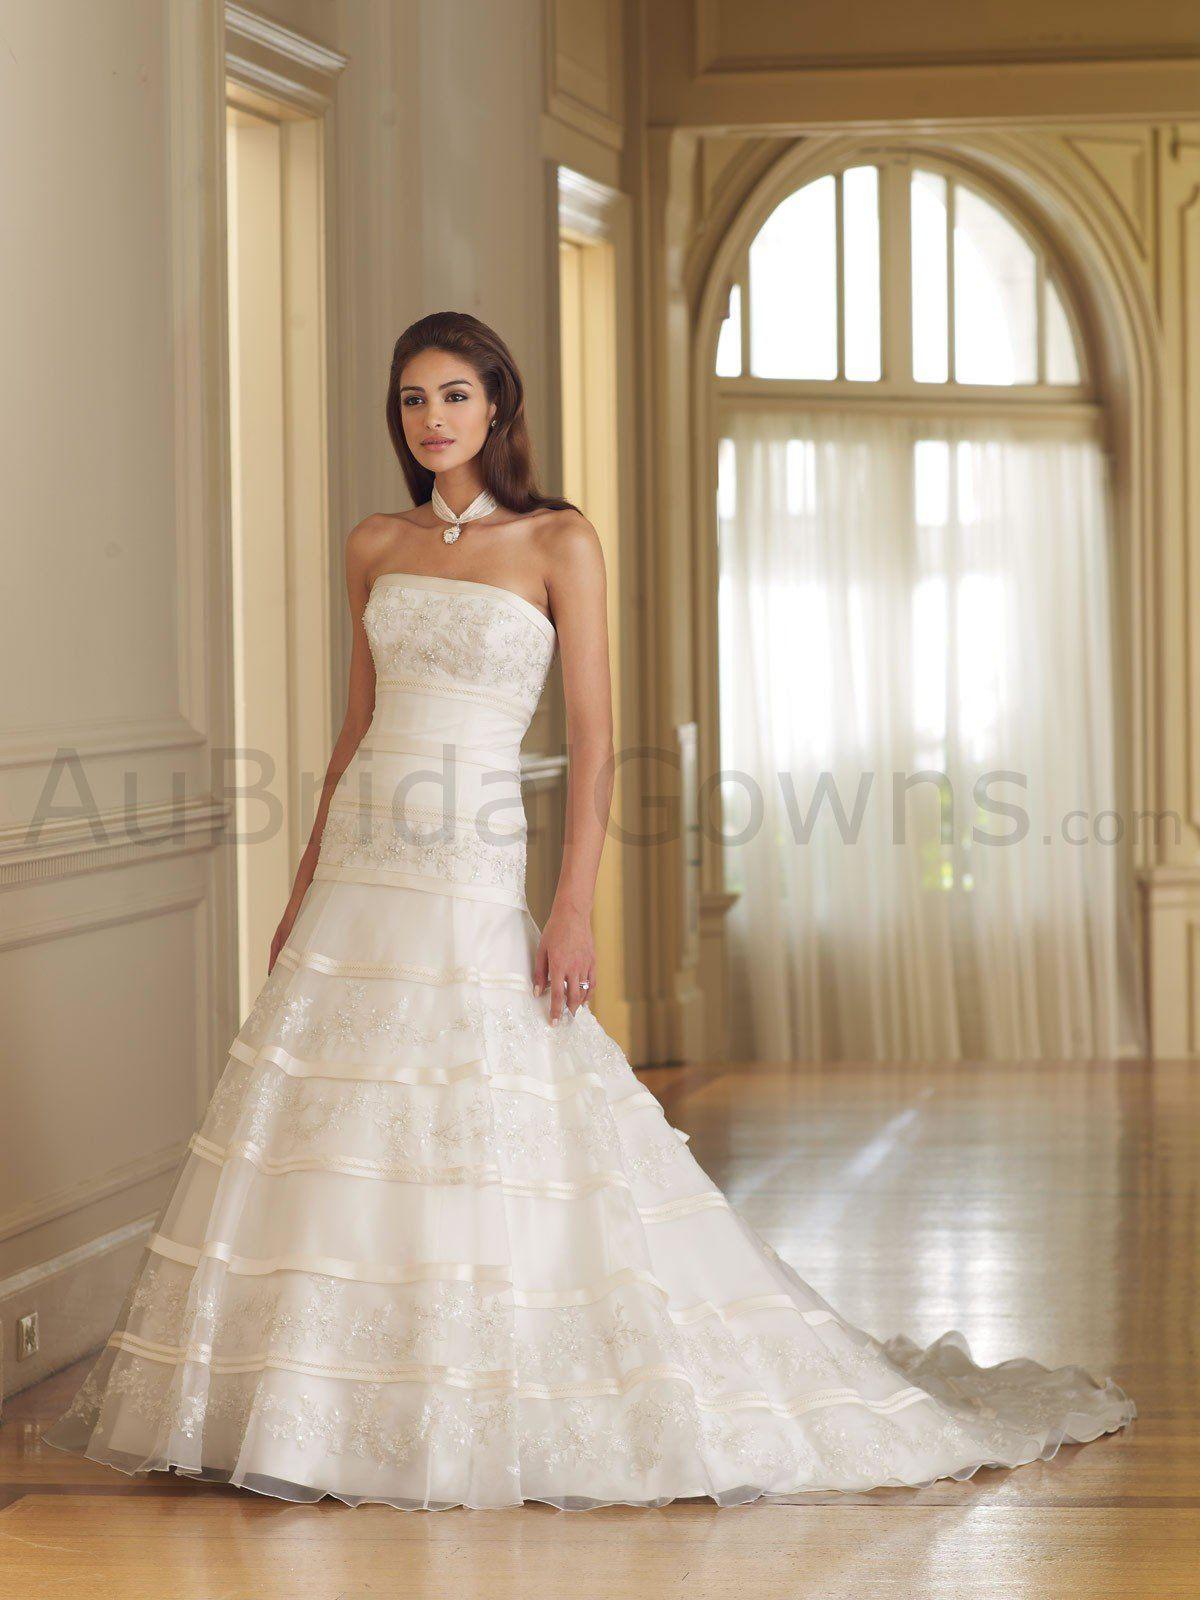 Organza strapless softly curved back bodice aline wedding dress